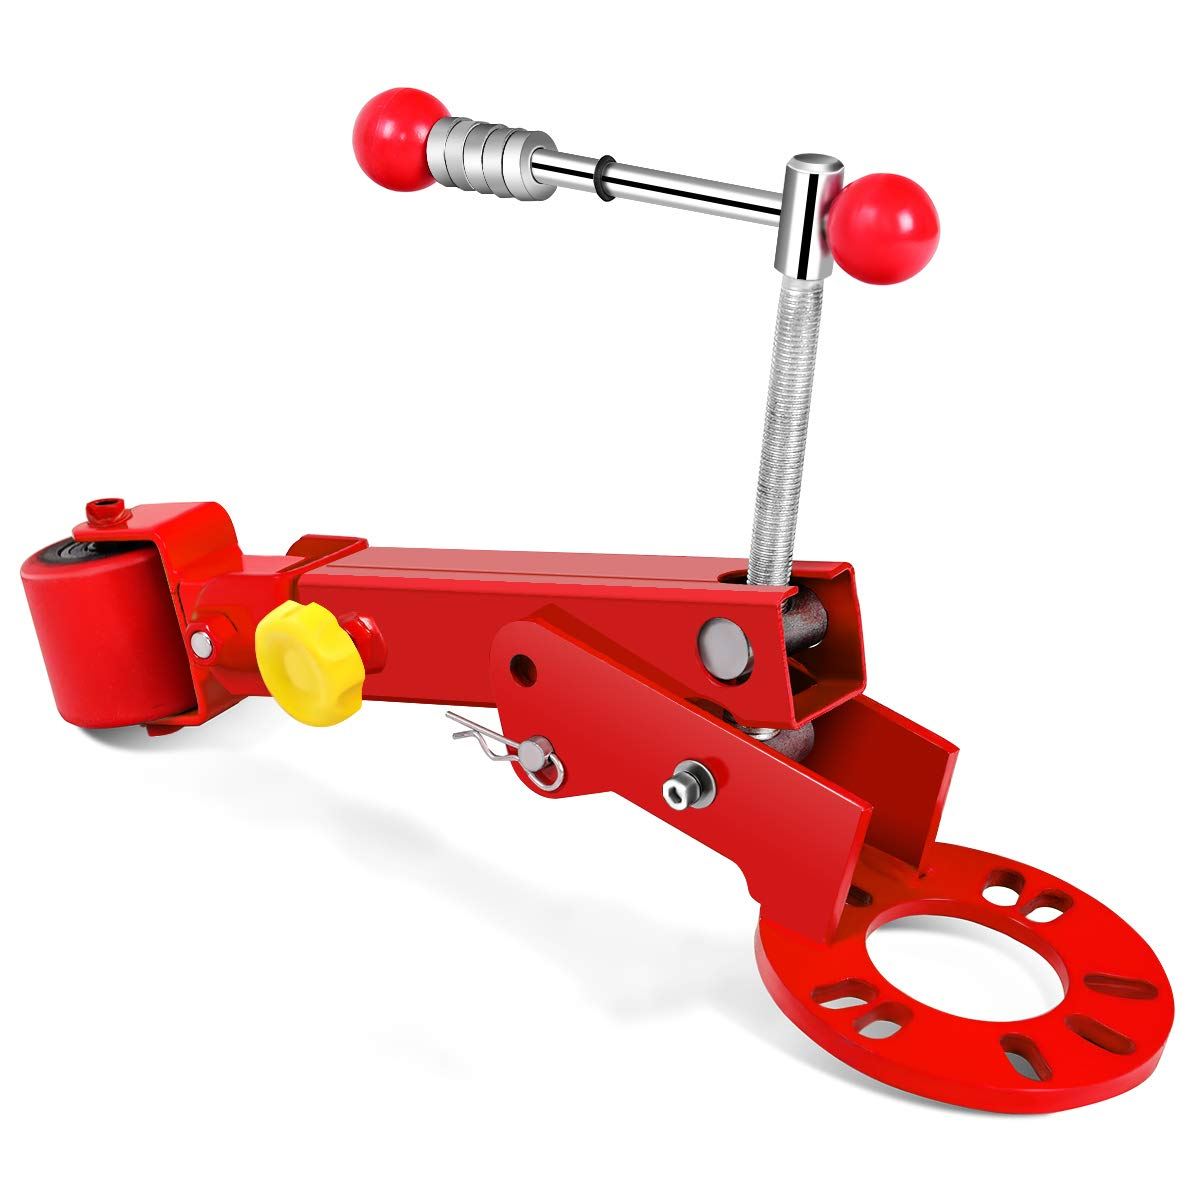 Goplus Fender Roller Reforming Extending Tool Wheel Arch Roller Flaring Former Heavy Duty